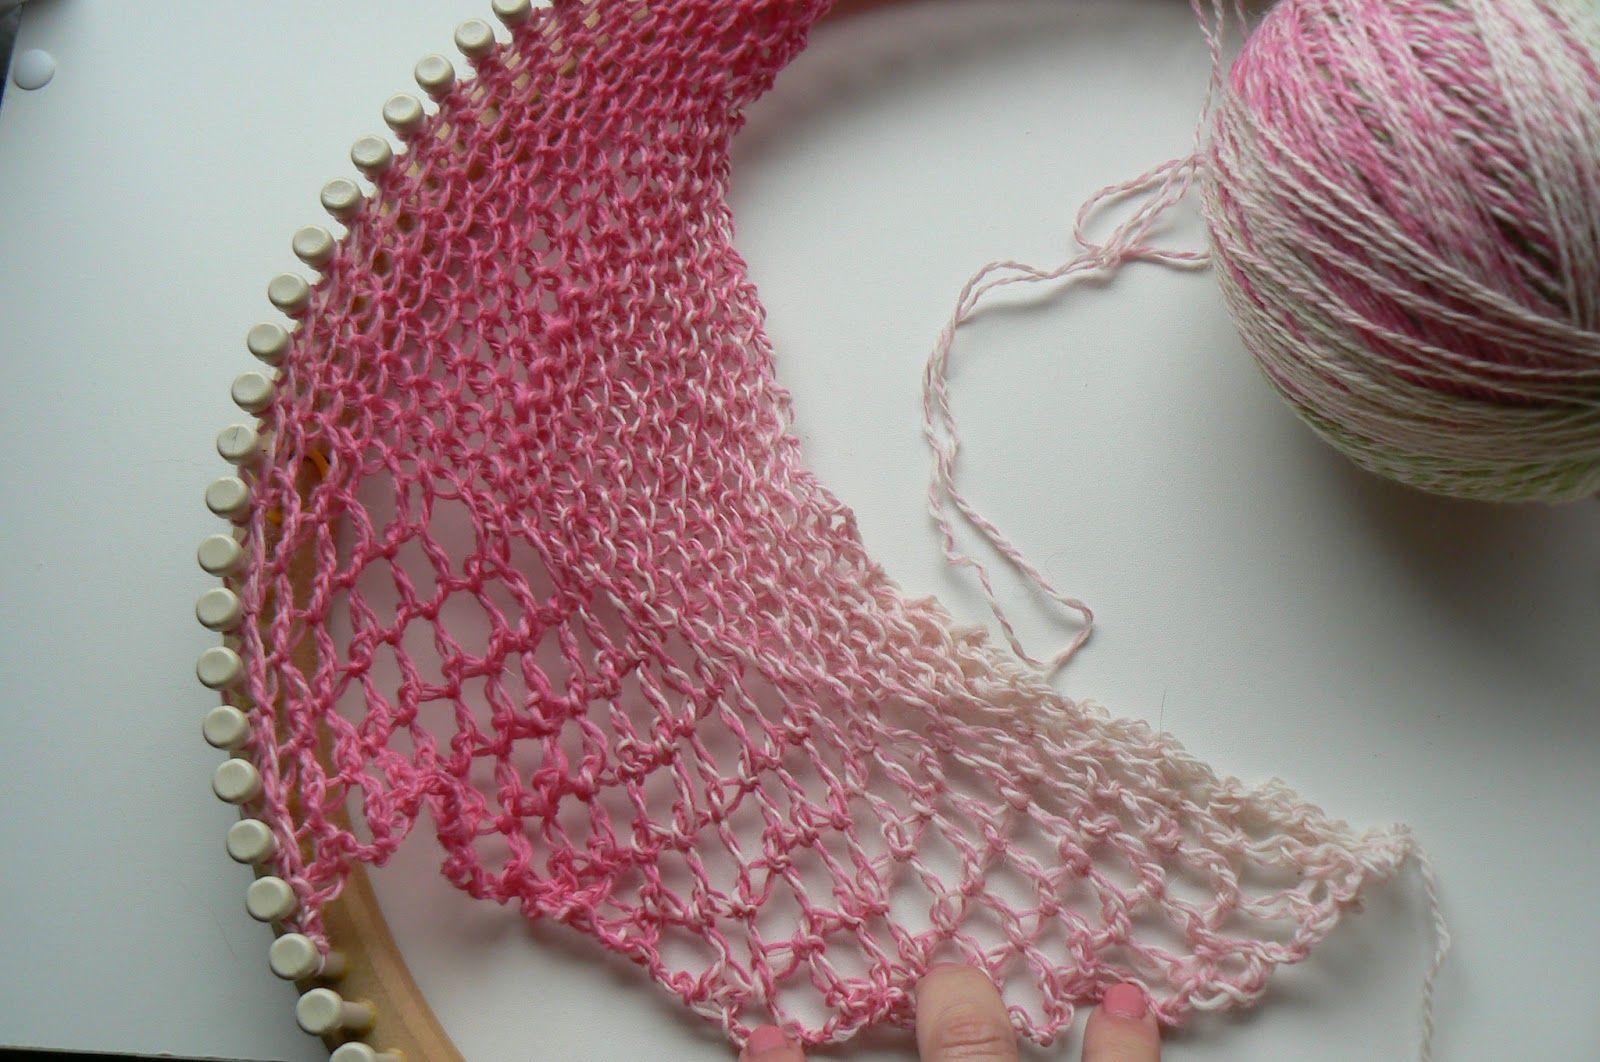 martha stewart knitting loom patterns | ... Loom Innovative Patterns ...